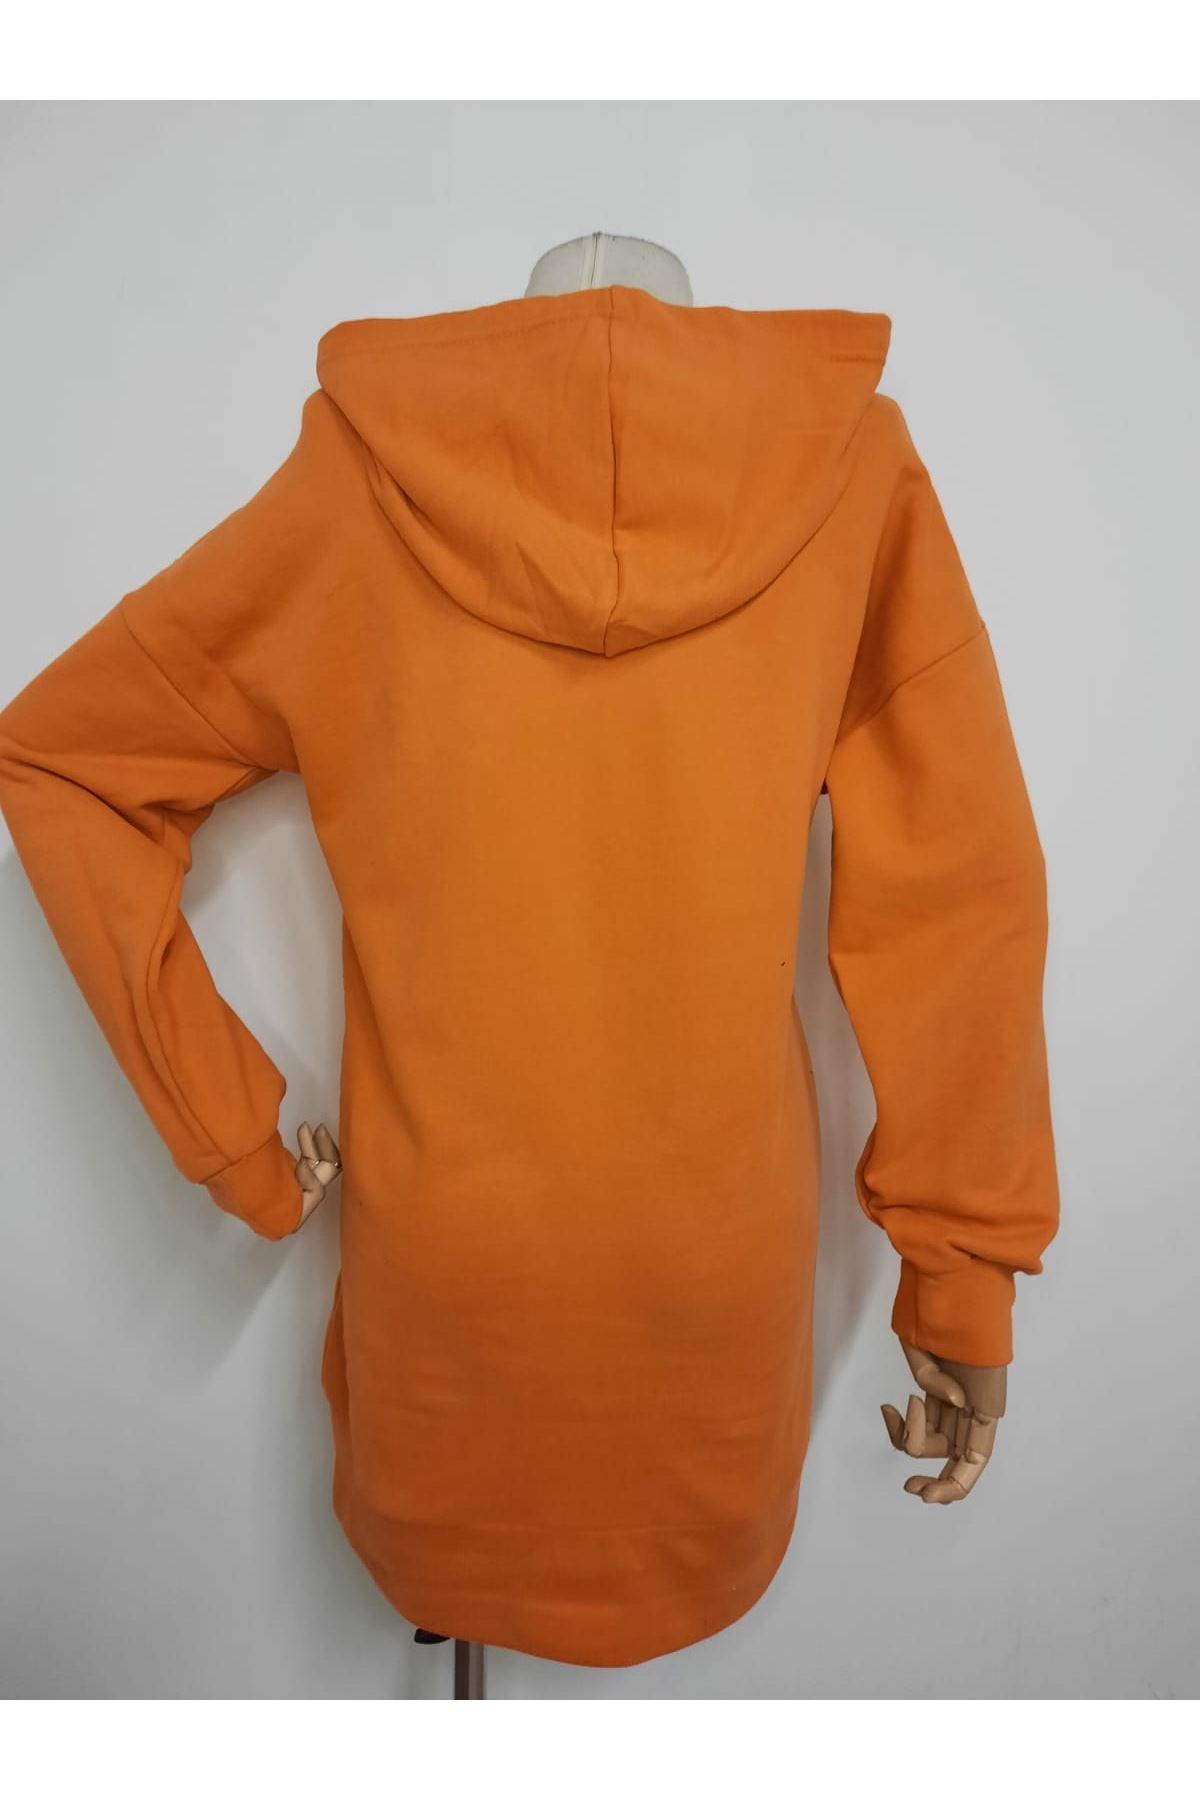 BB Uzun Sweatshirt  - TURUNCU